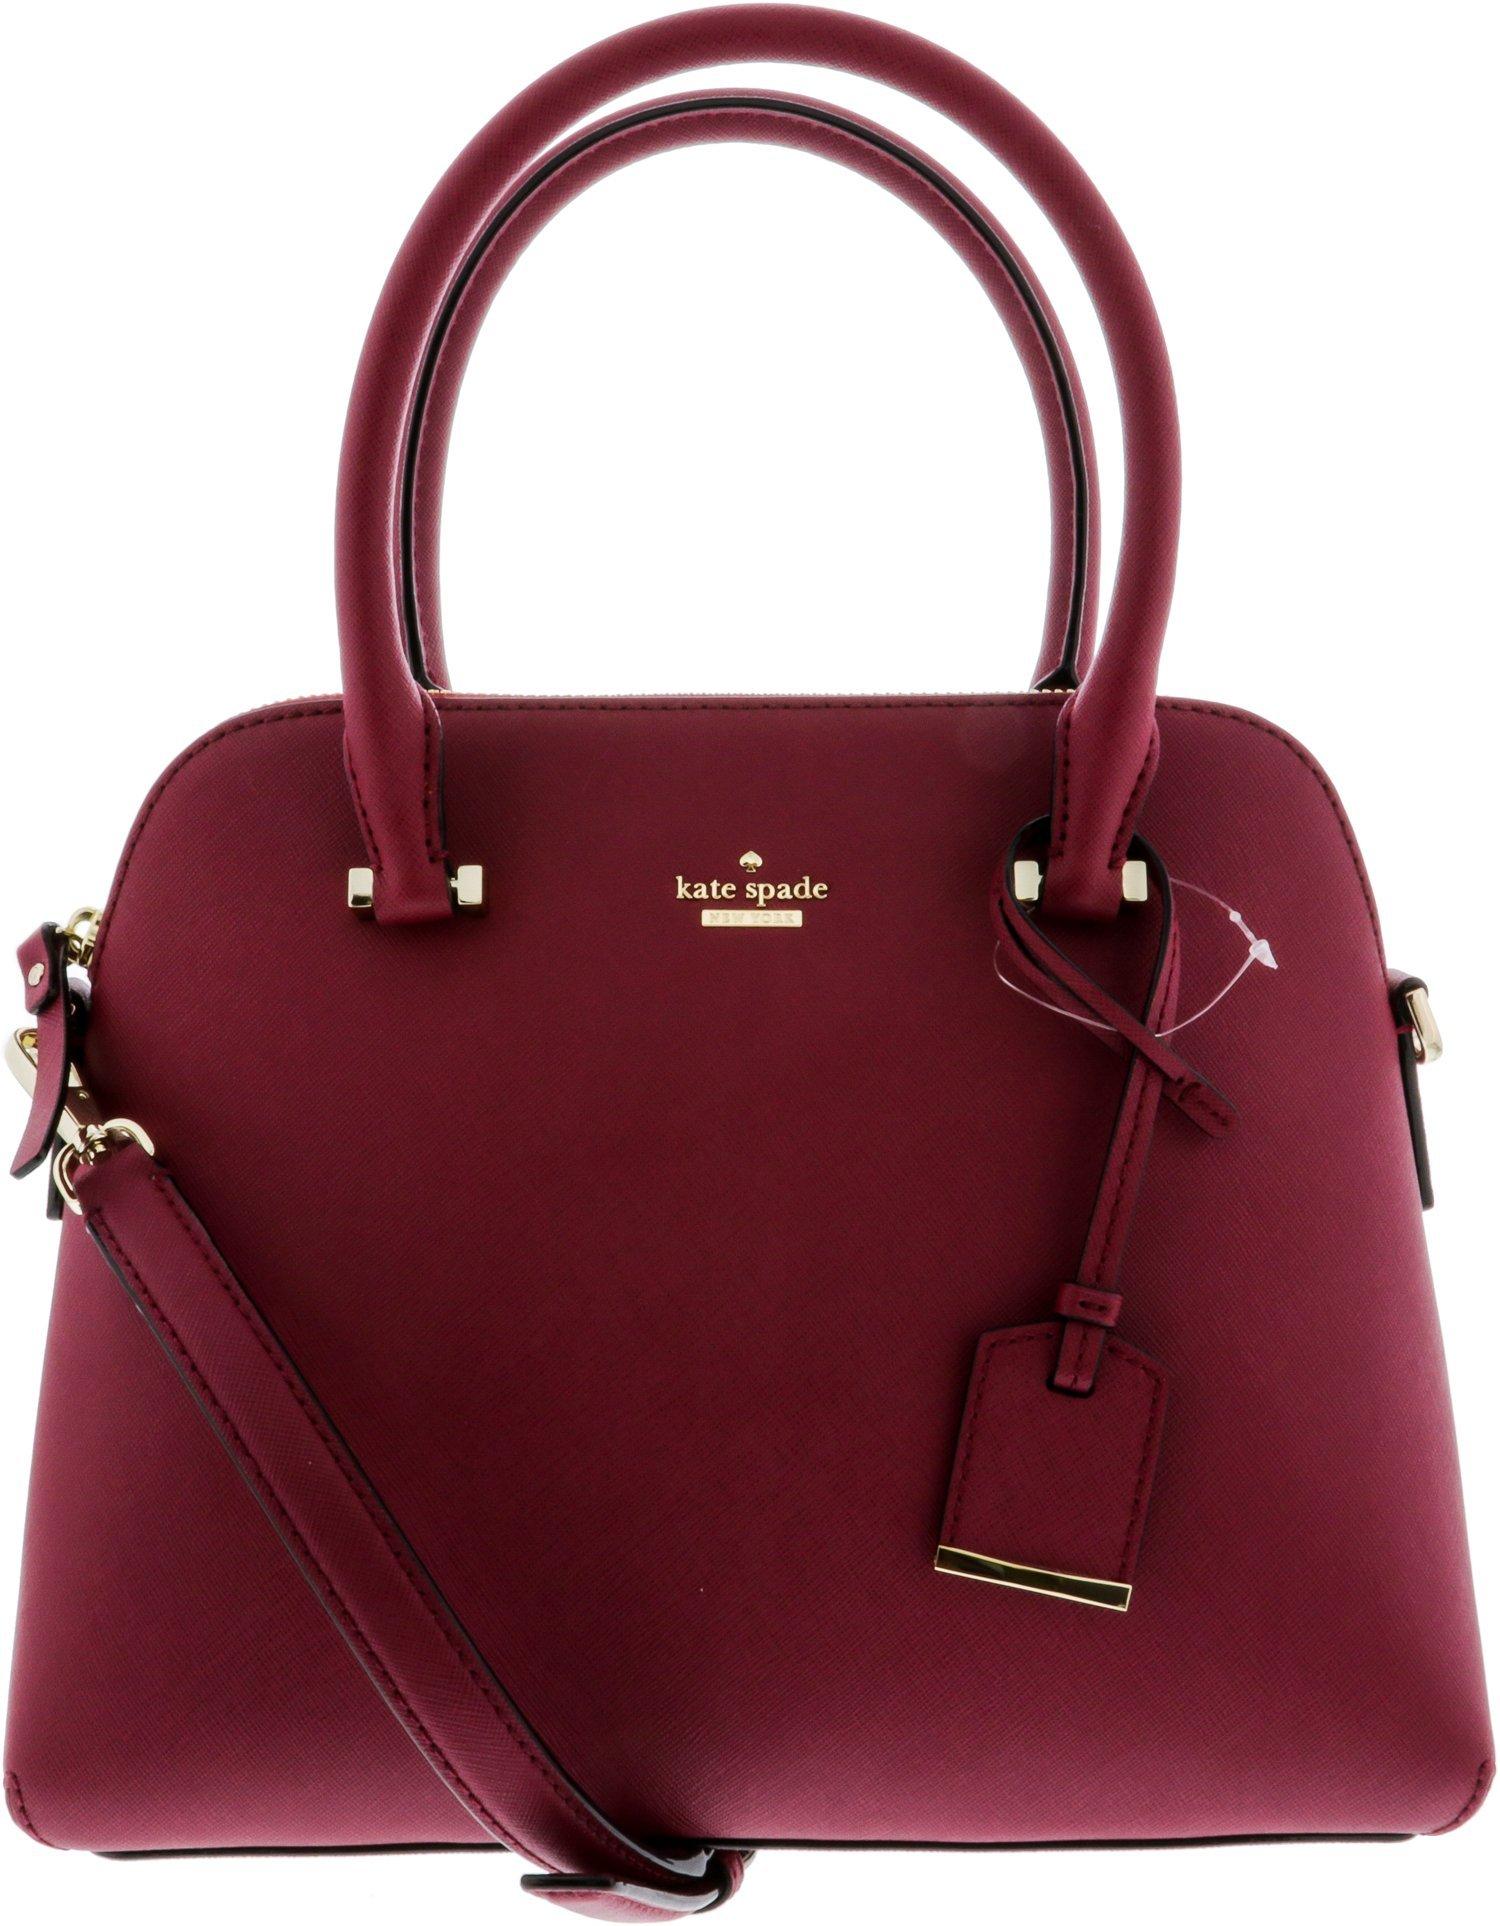 Kate Spade Women's Cameron Street Maise Satchel Leather Top-Handle Bag - Tempranill